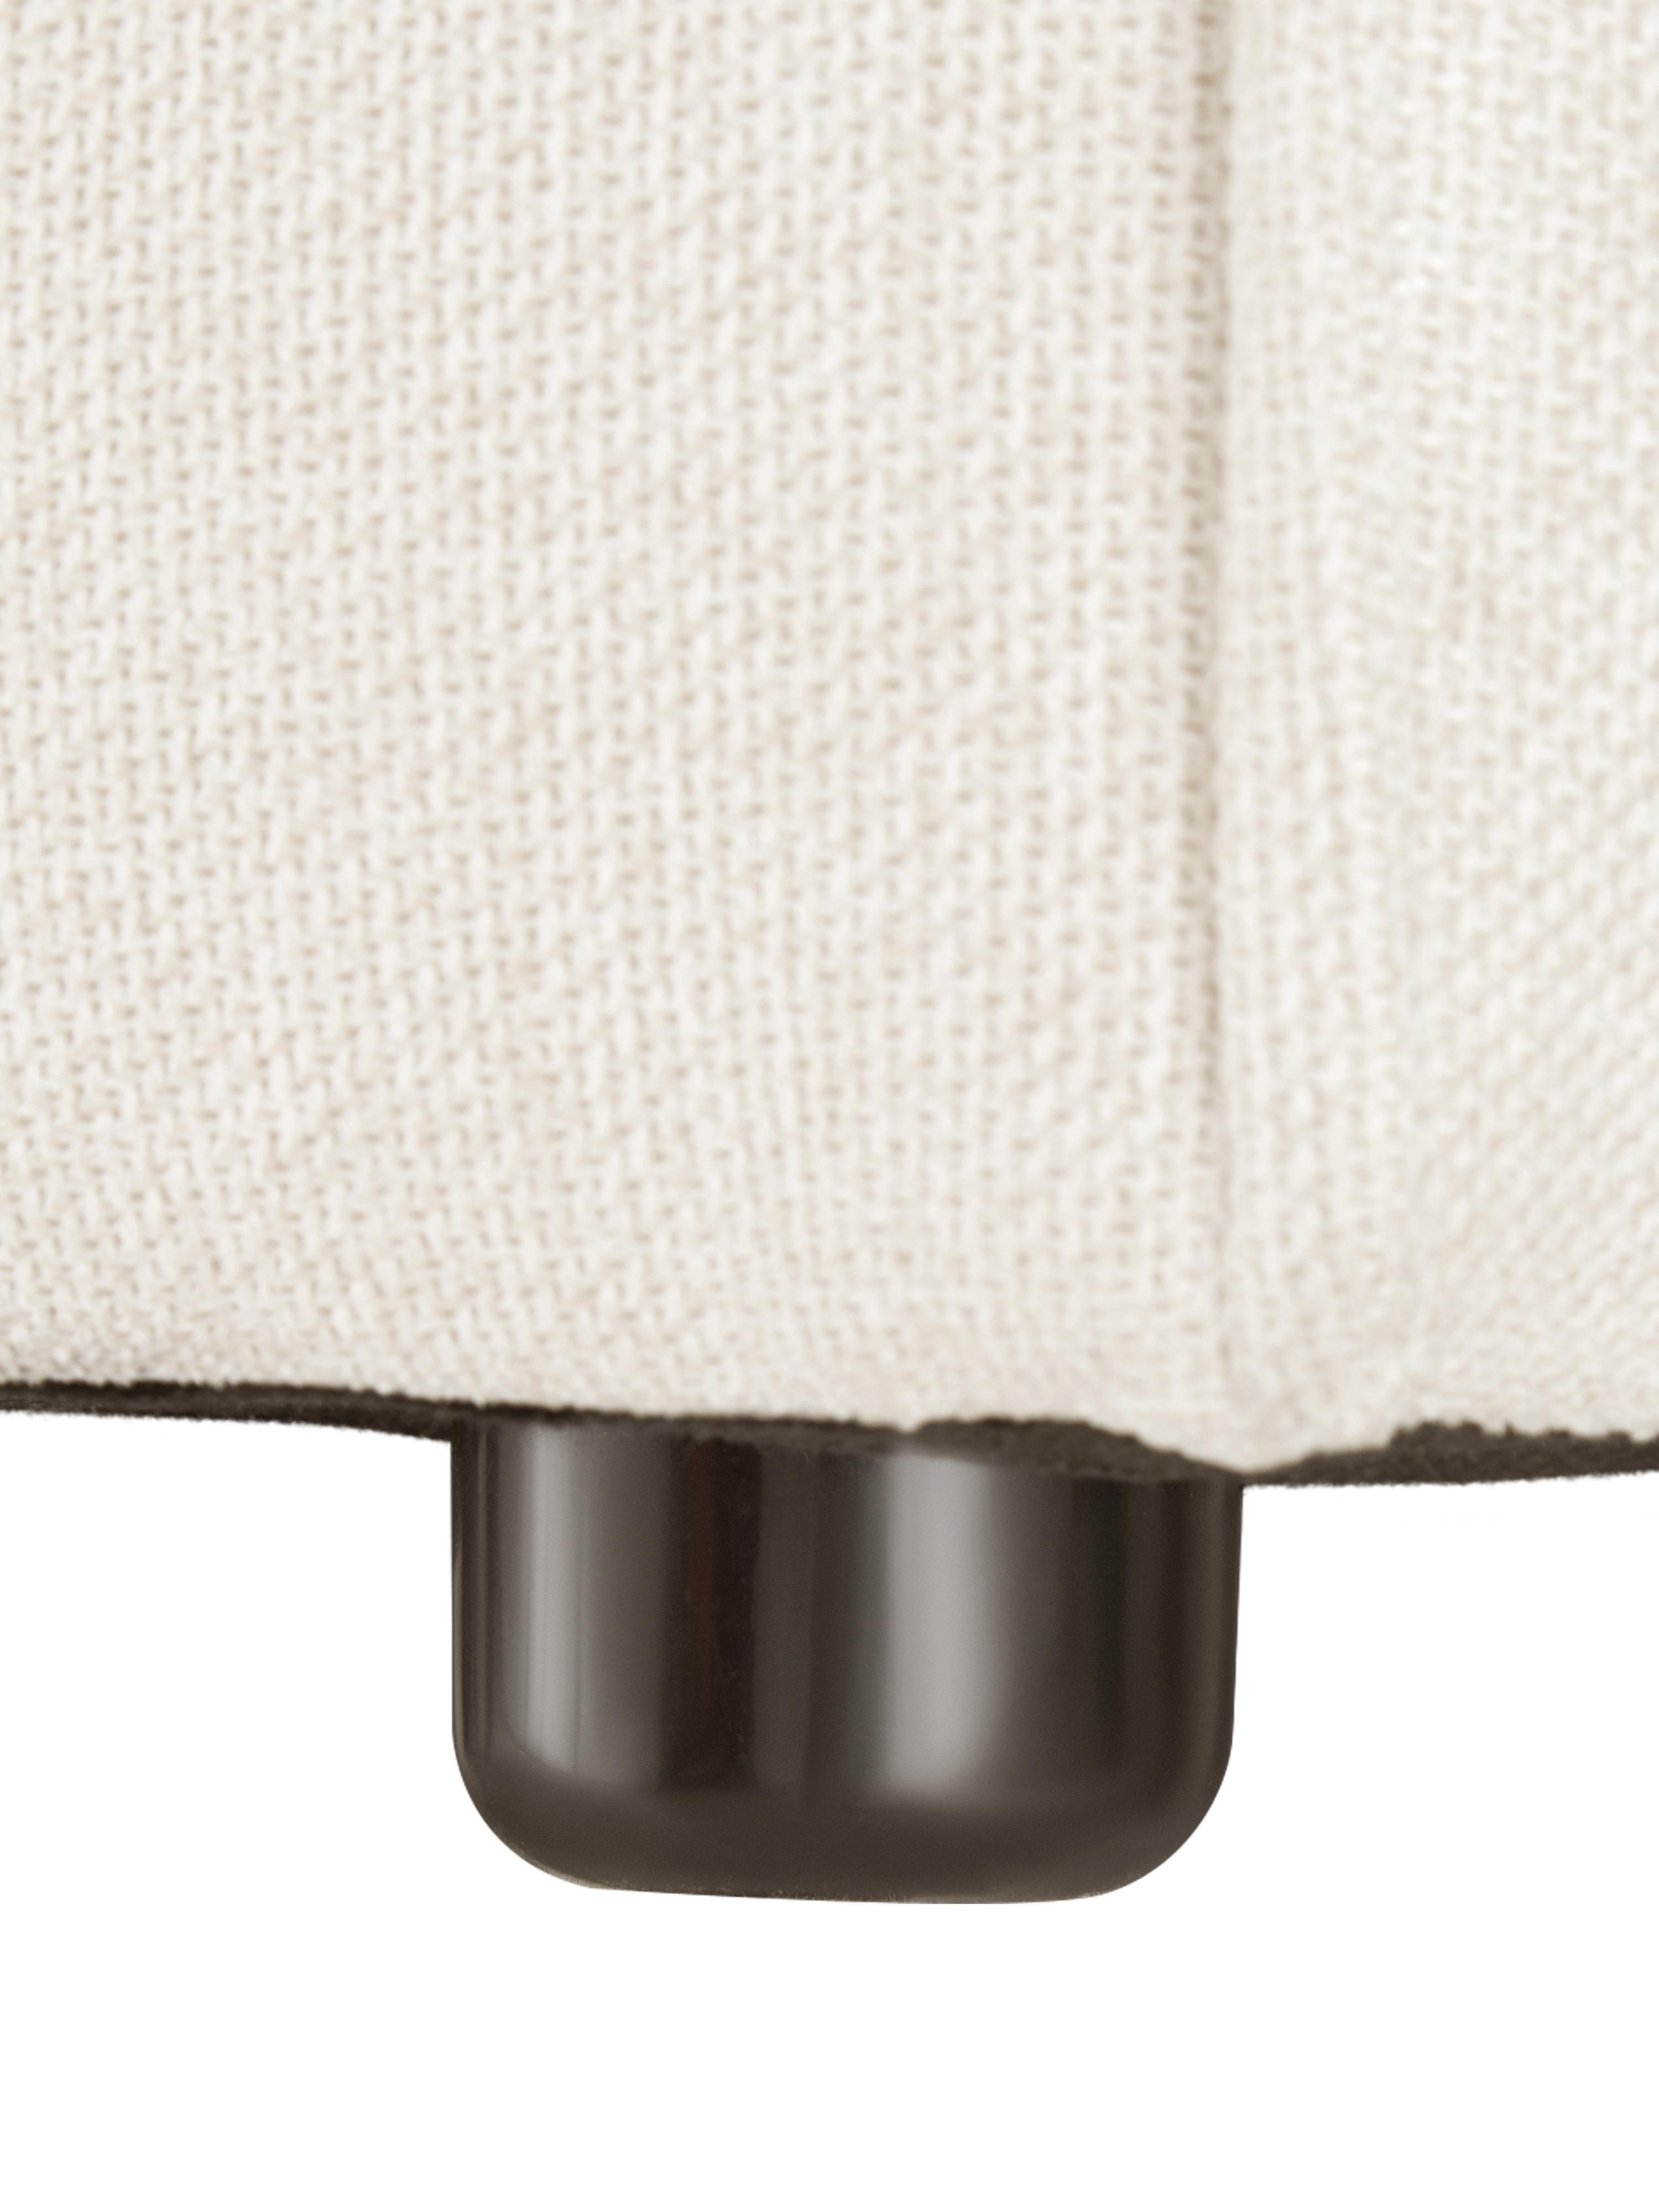 Modulare XL-Ottomane Lennon, Bezug: Polyester Der hochwertige, Gestell: Massives Kiefernholz, Spe, Füße: Kunststoff, Webstoff Beige, B 357 x T 119 cm